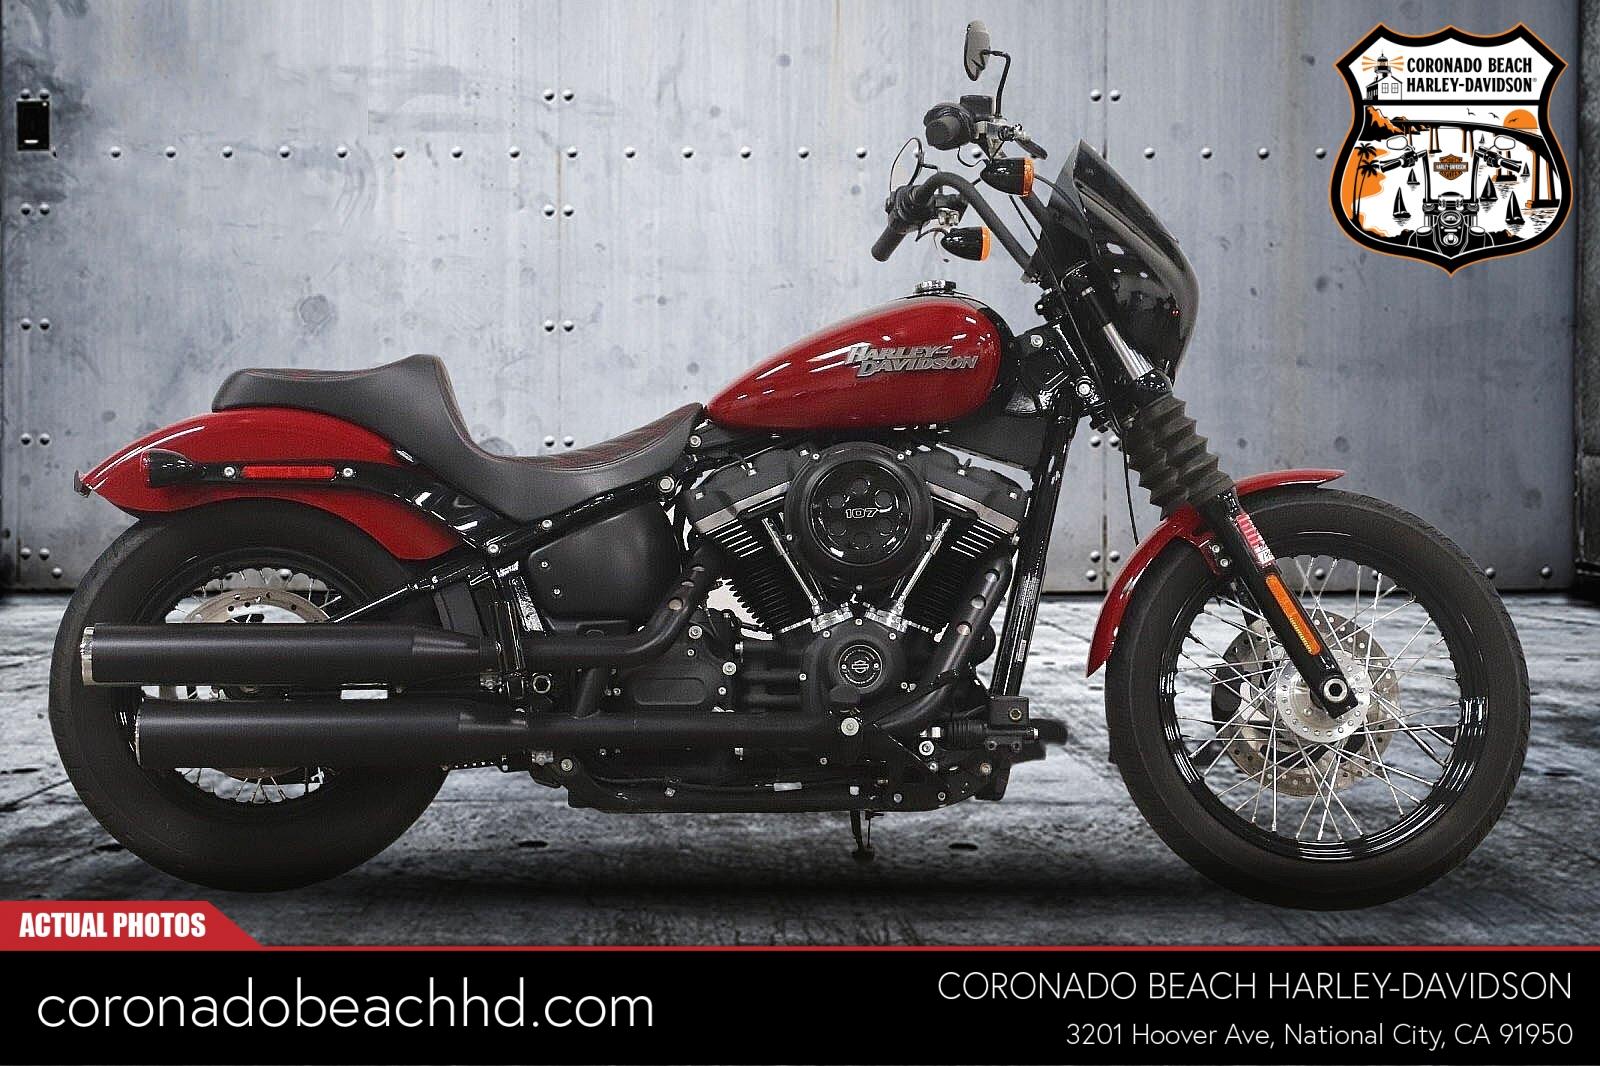 2020 Harley-Davidson Street Bob [6]